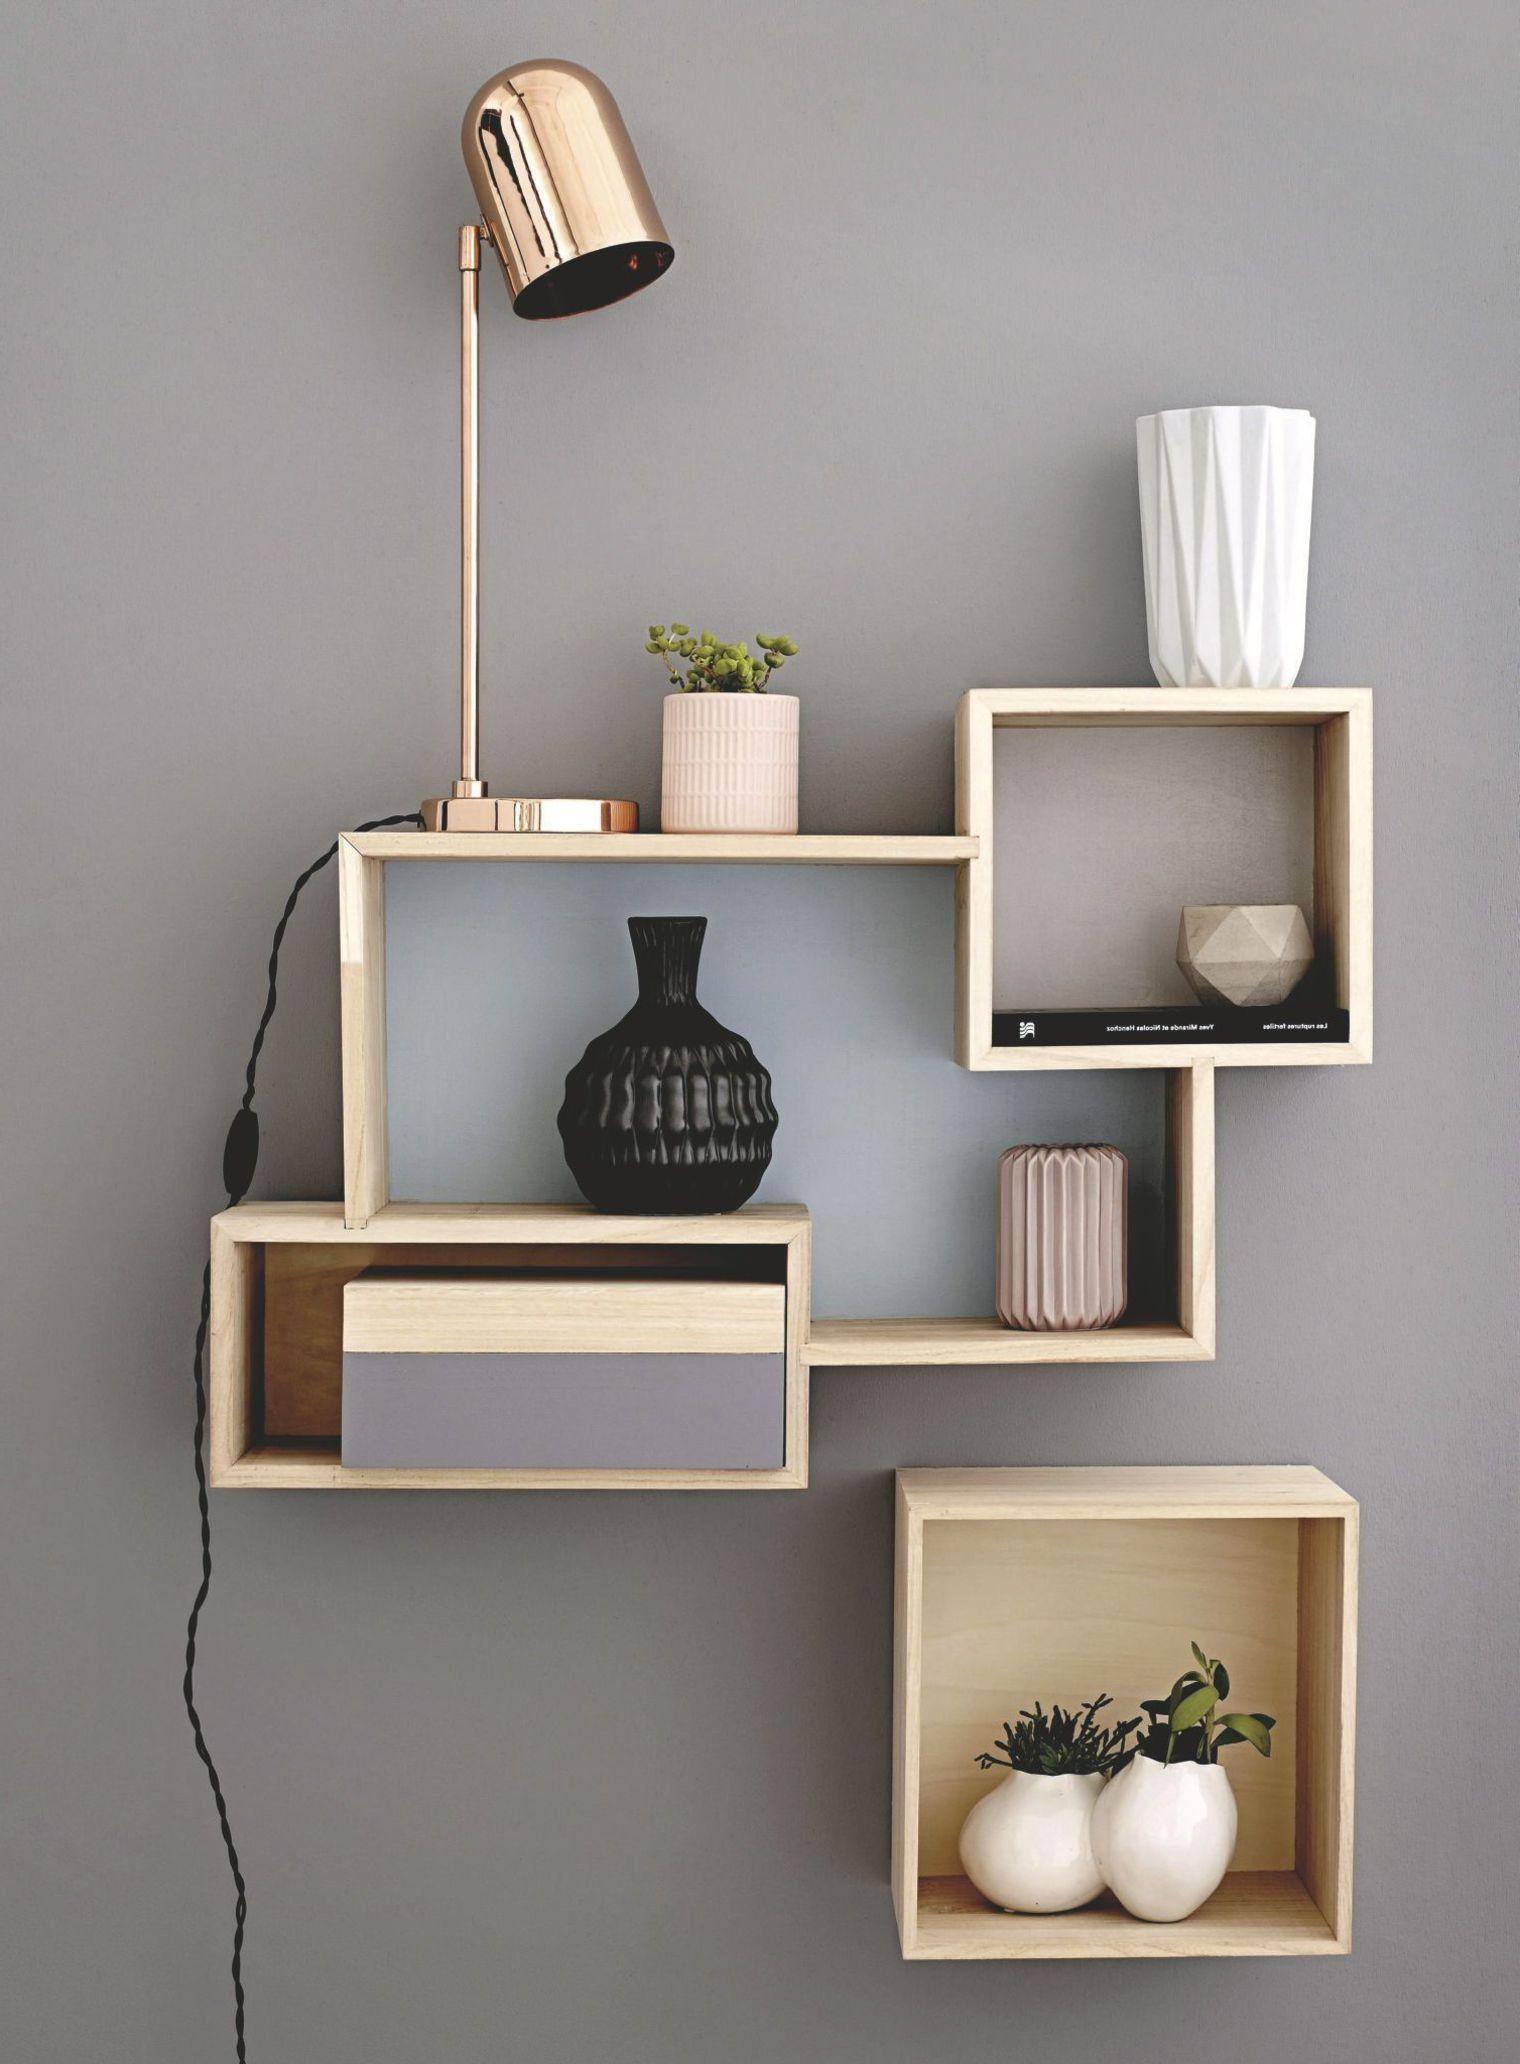 Photo Etagere Murale Salle De Bains Ikea